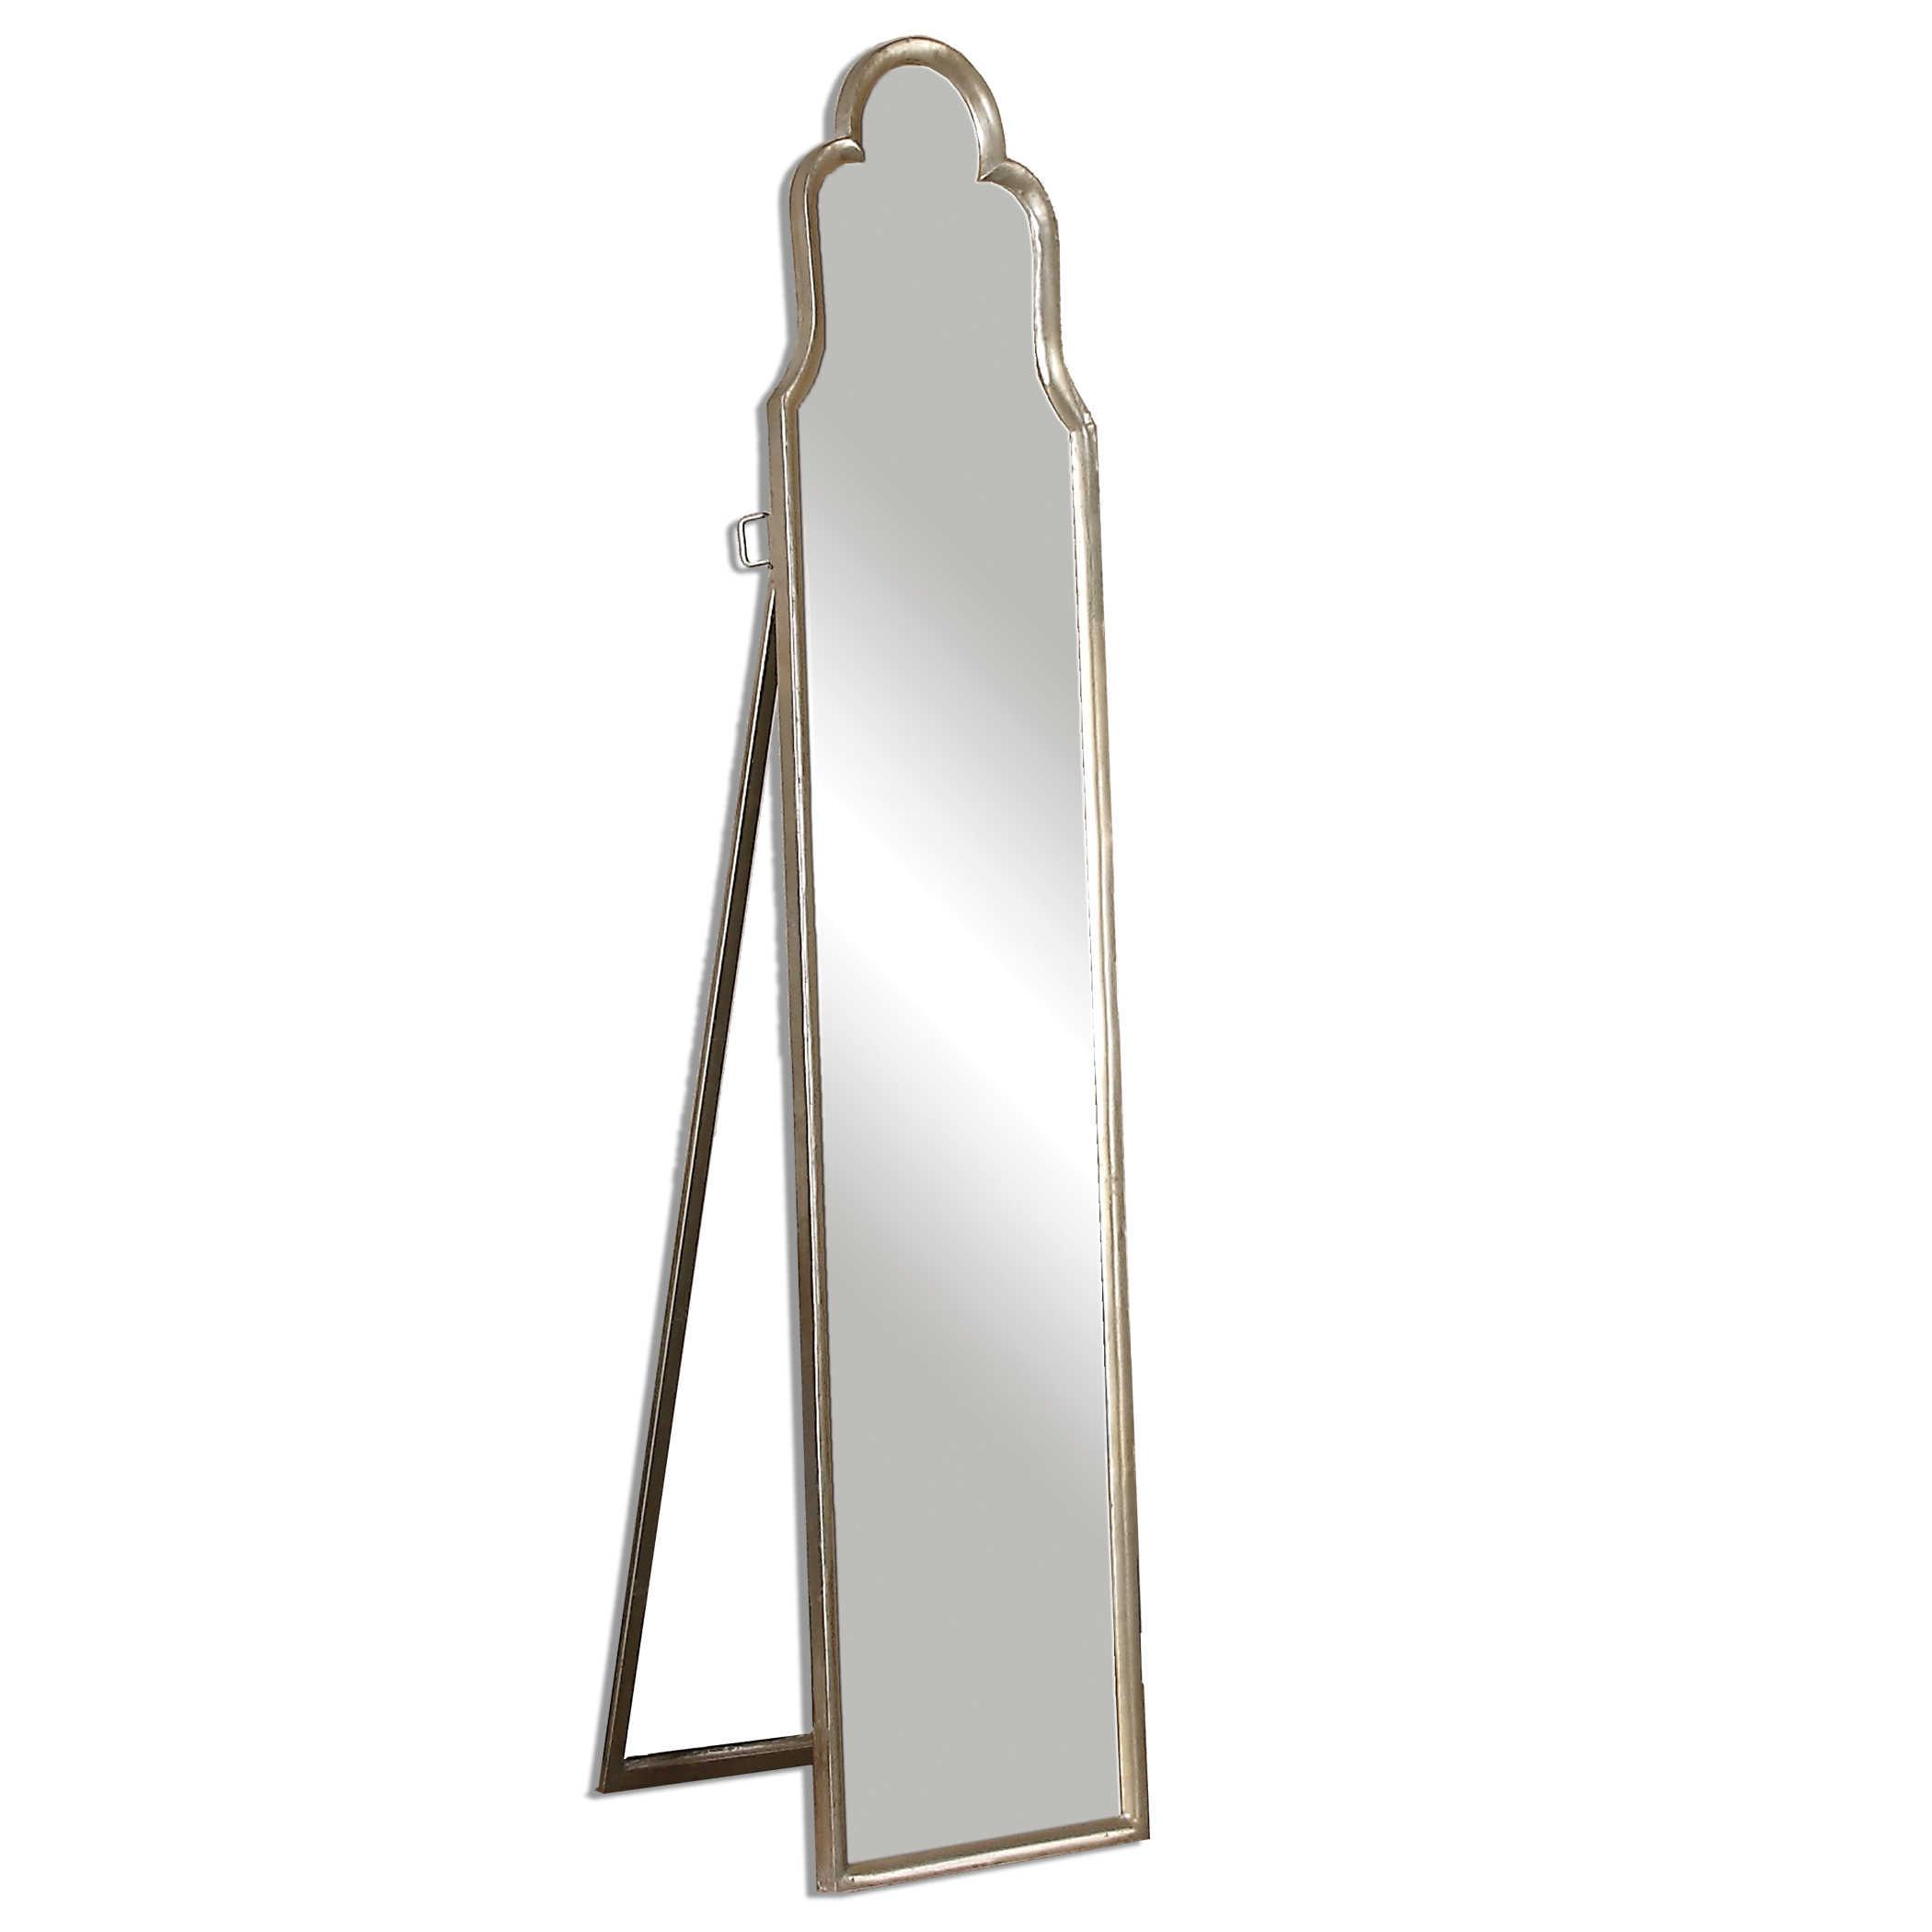 Standing Mirror-$532.00